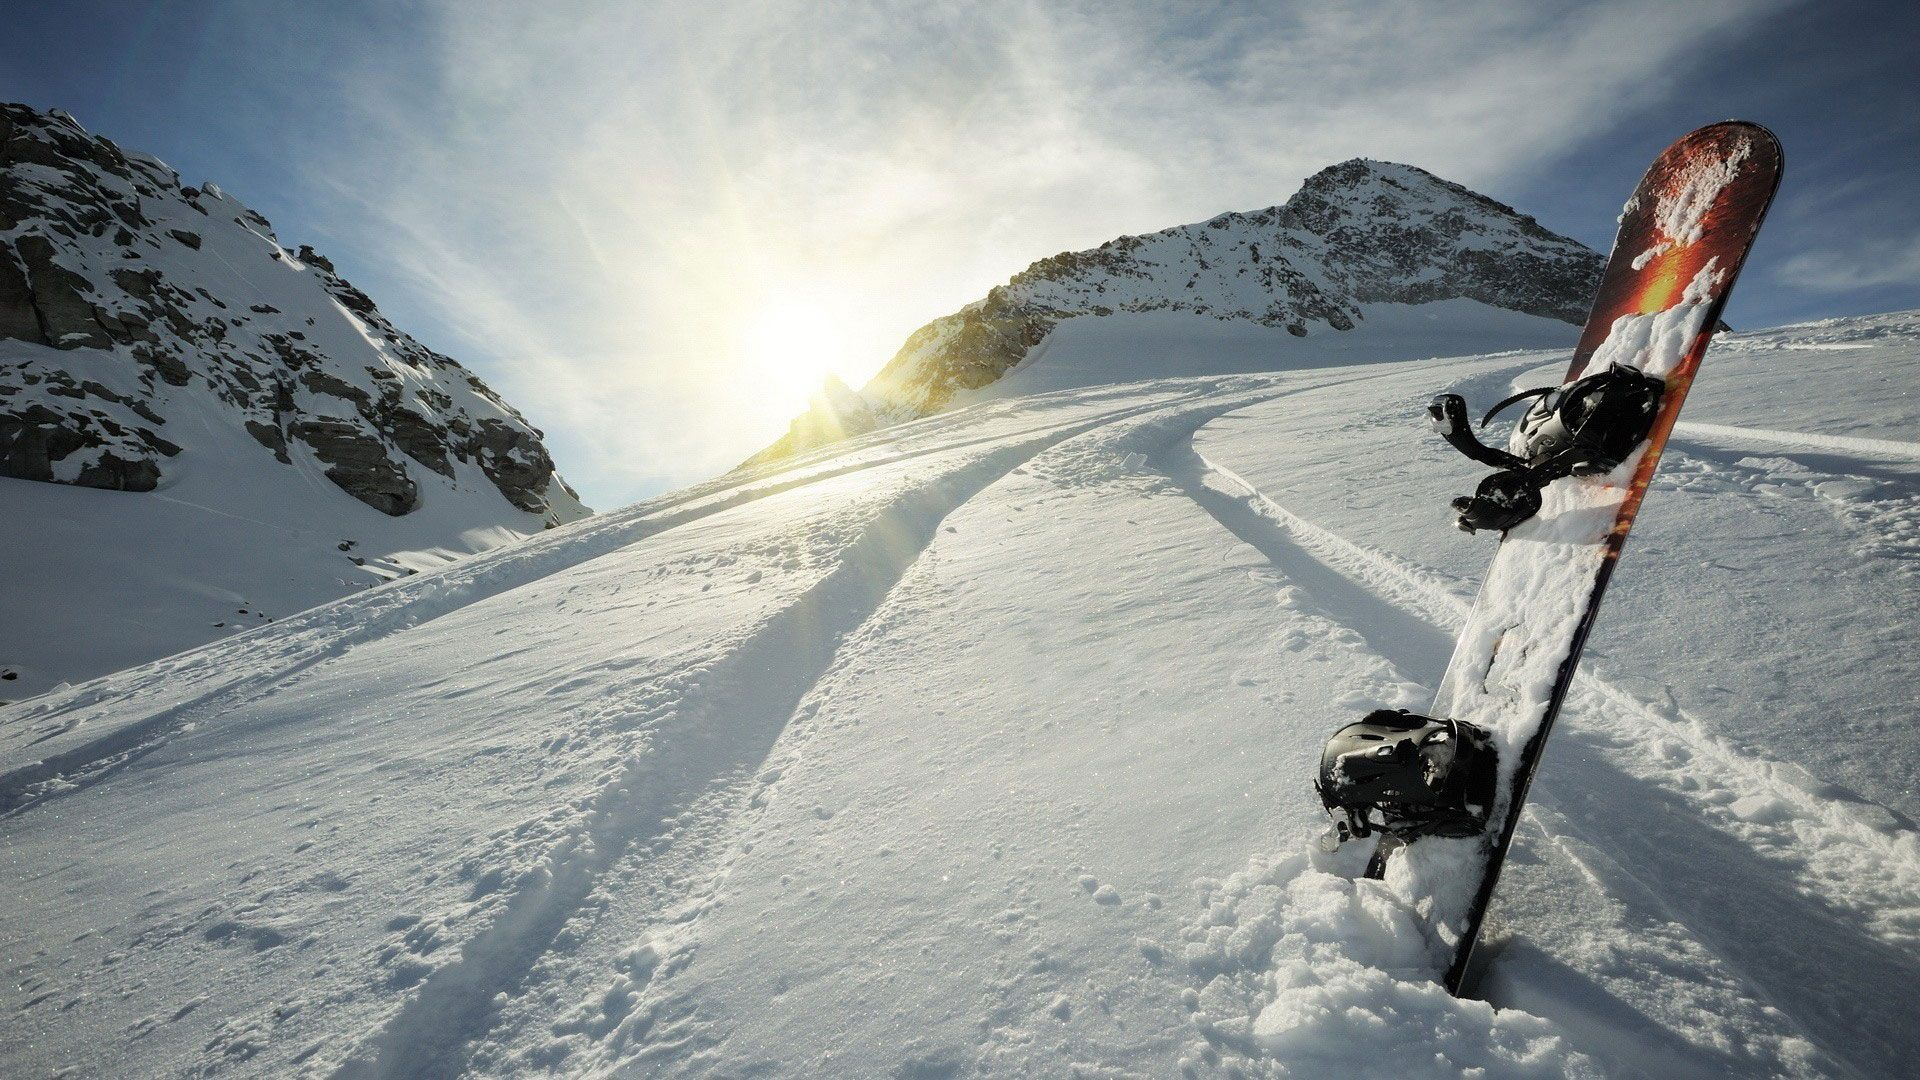 сноуборд картинки на телефон компании